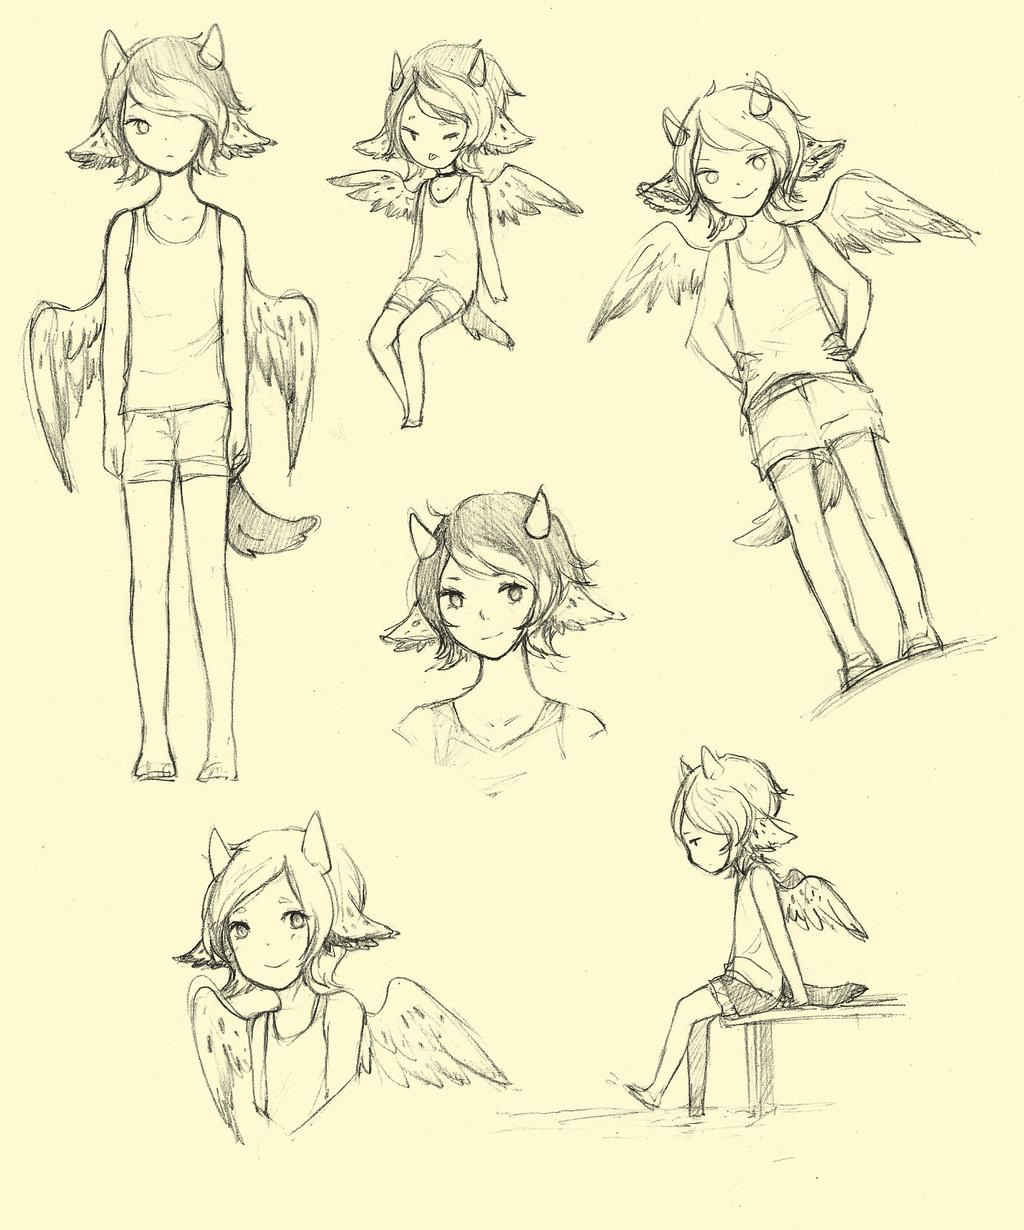 Ara sketches